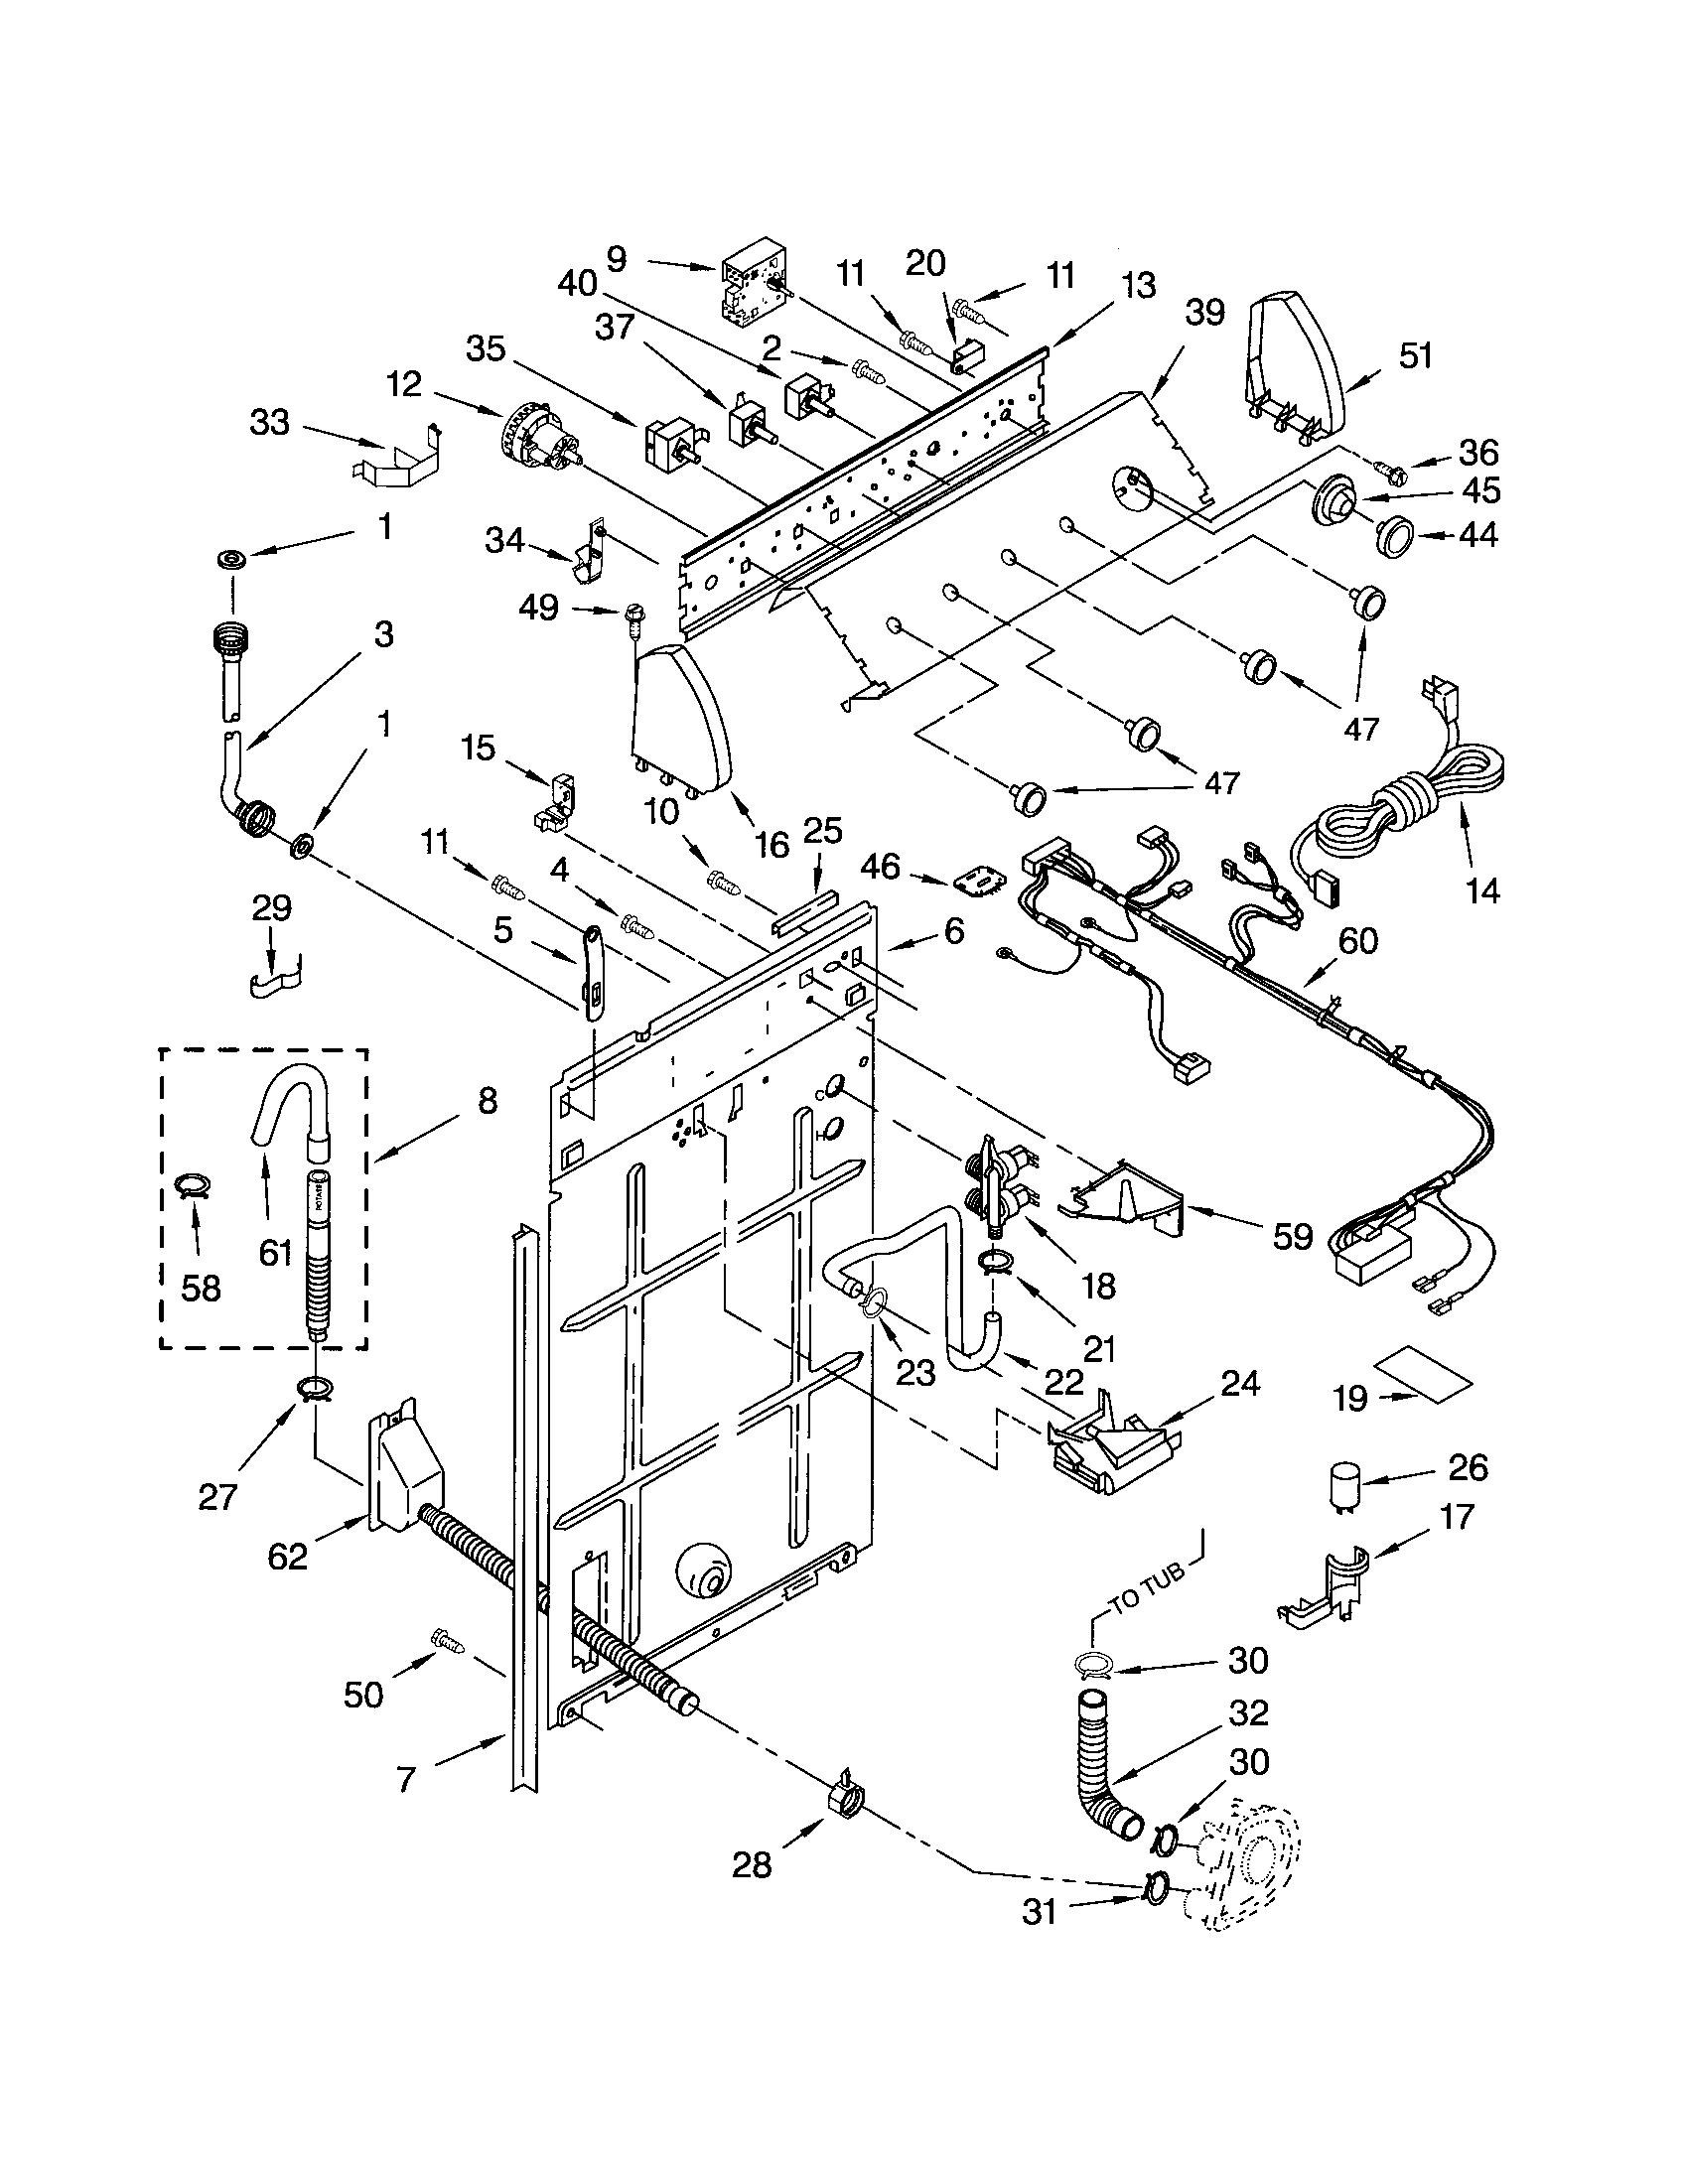 whirlpool washer model lsq9565mq0